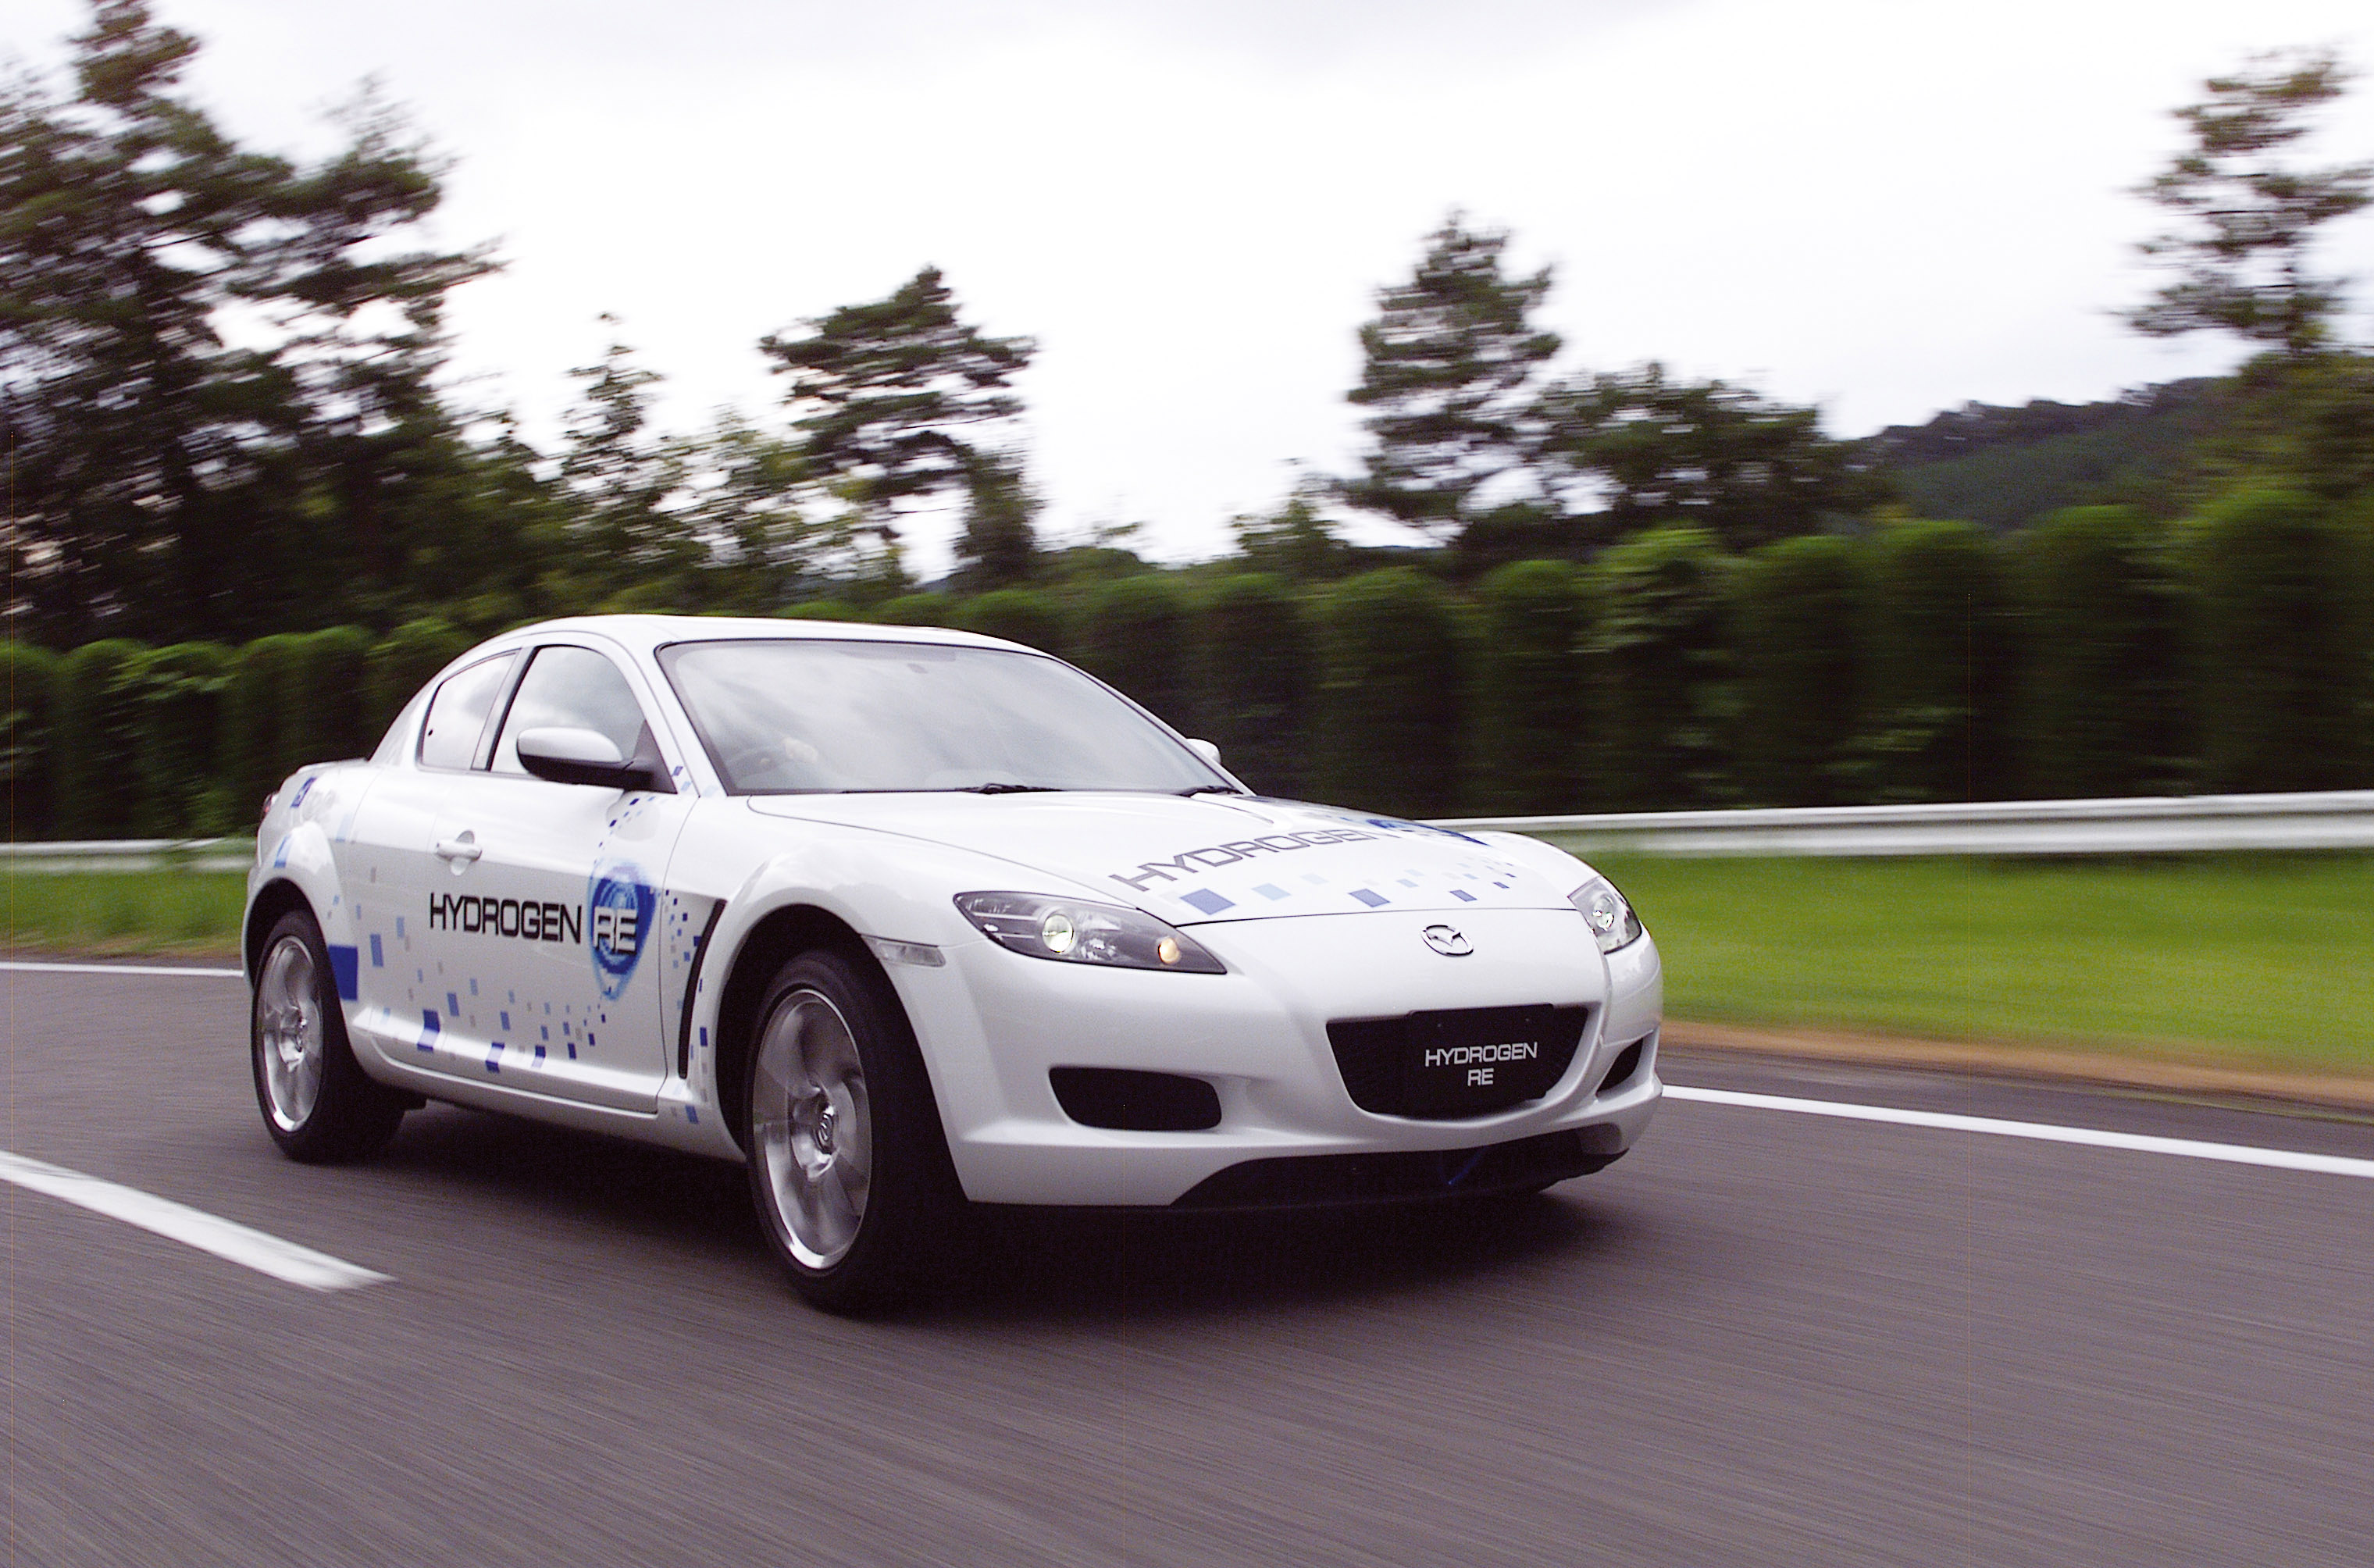 https://www.carsinvasion.com/gallery/2003-mazda-rx-8-hydrogen-concept/2003-mazda-rx-8-hydrogen-concept-07.jpg